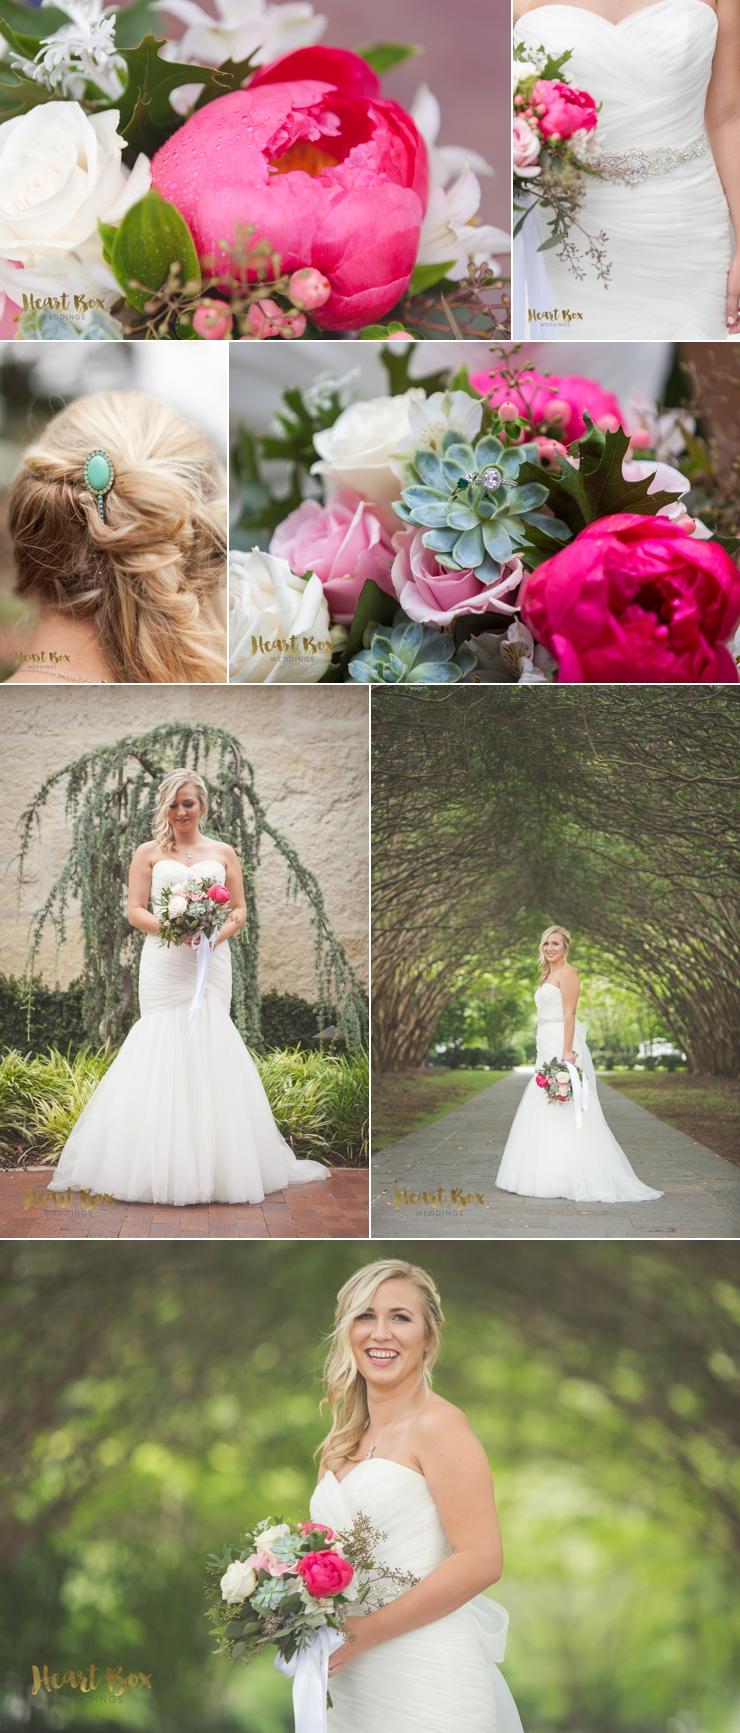 Karlee Bridal Blog Collages 1.jpg